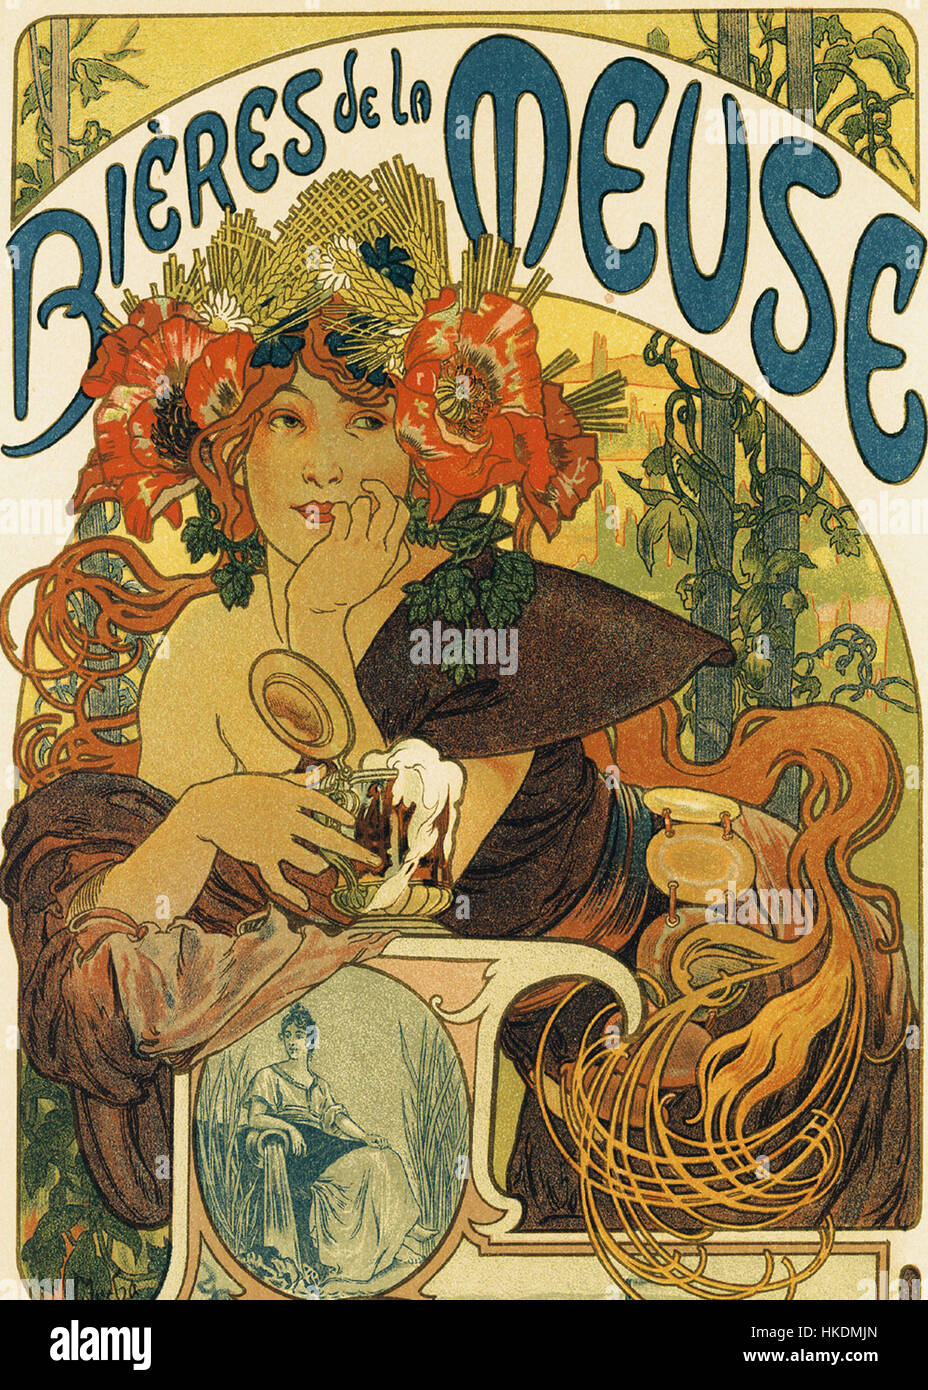 Alphonse Mucha   Bieres de la Muse - Stock Image